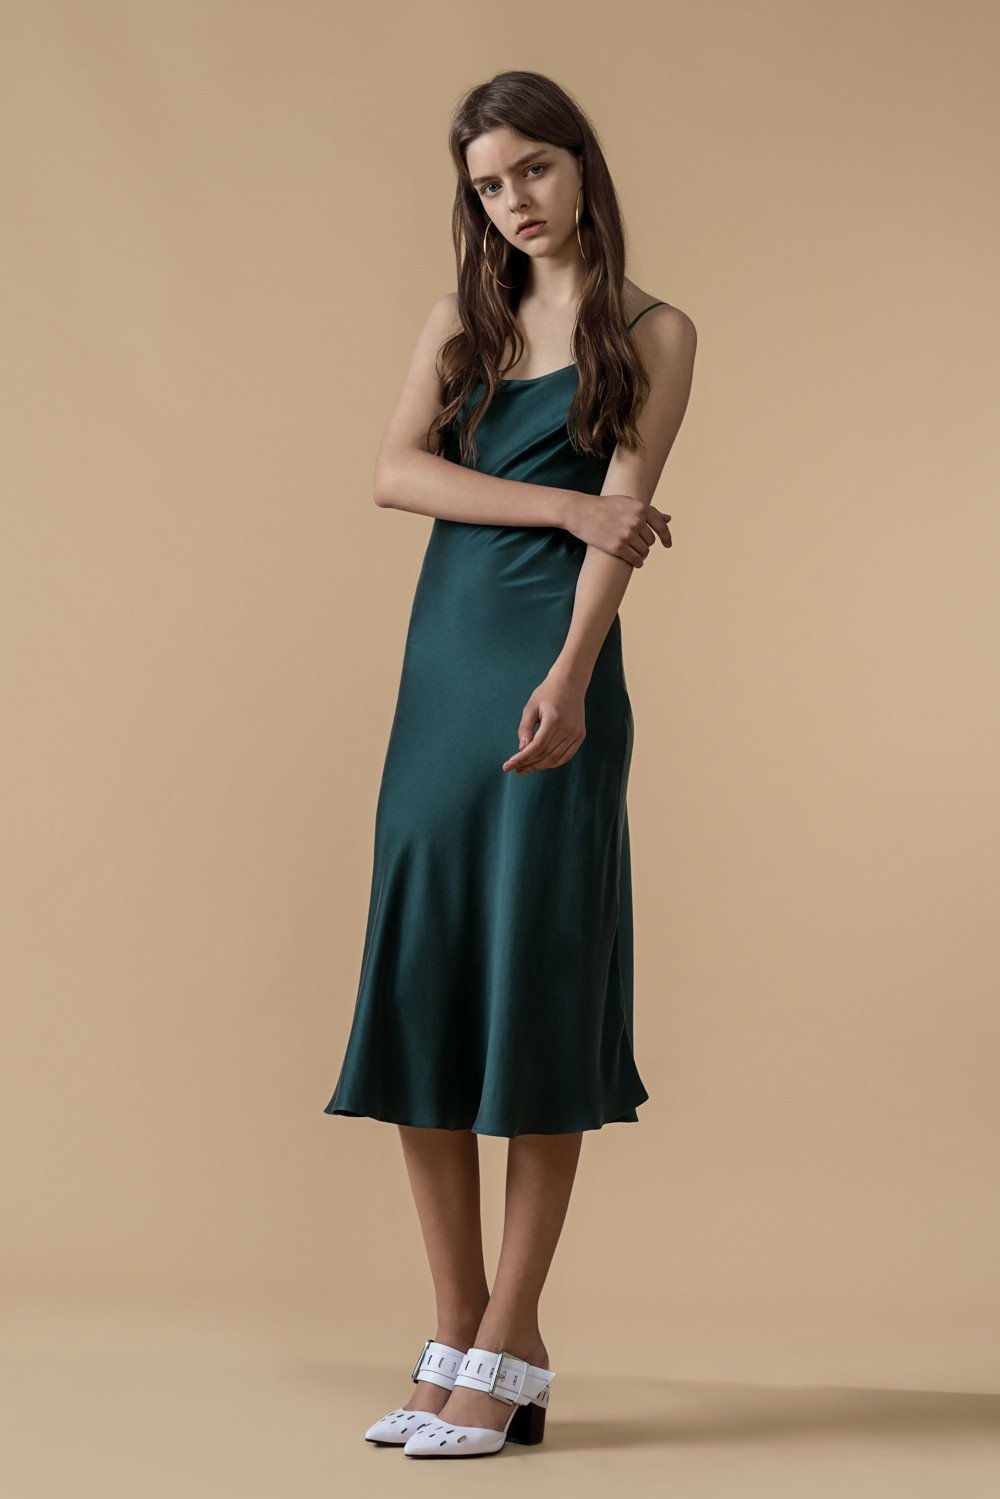 Slip on Silk Dress